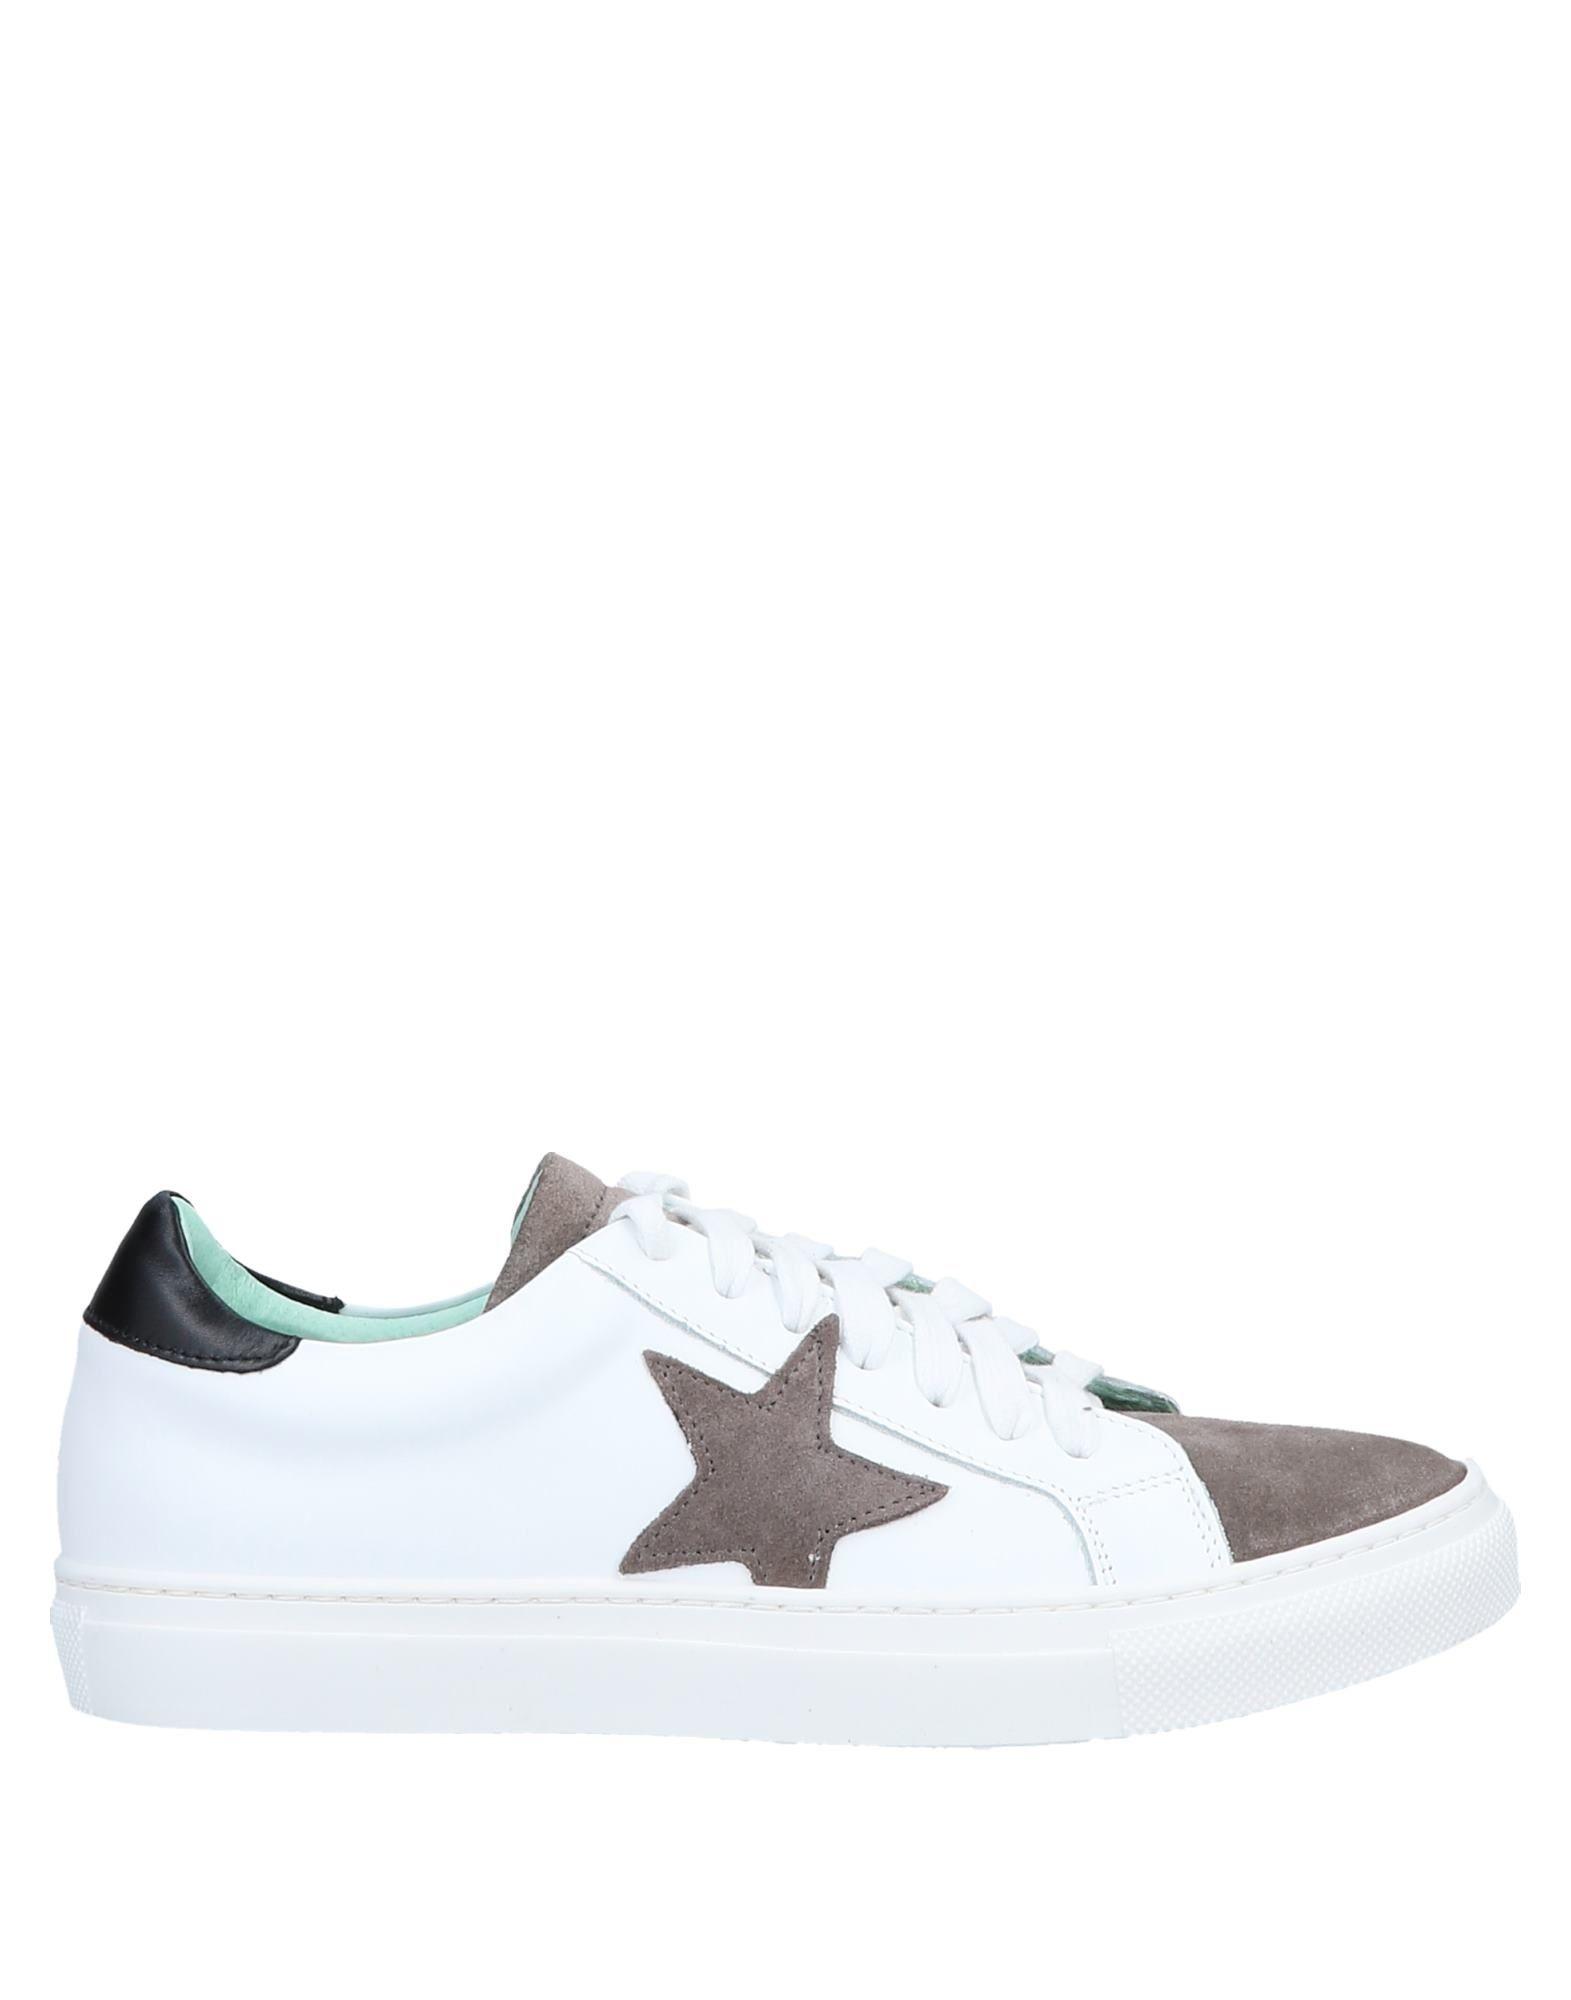 Tsd12 Sneakers  - Women Tsd12 Sneakers online on  Sneakers Canada - 11567519OH c94be5